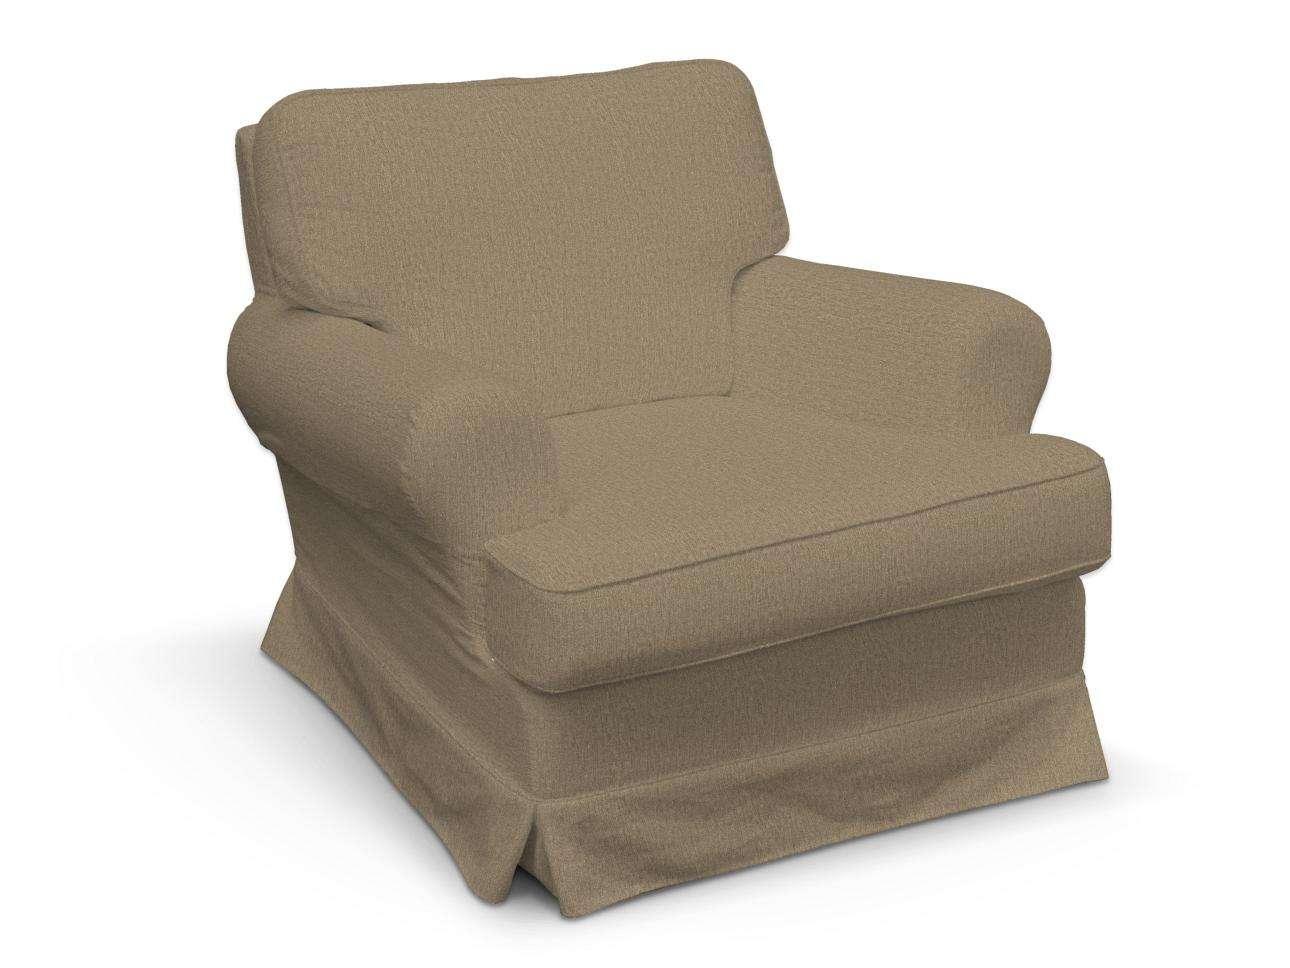 Barkaby Sesselbezug Sessel  Barkaby von der Kollektion Chenille , Stoff: 702-21